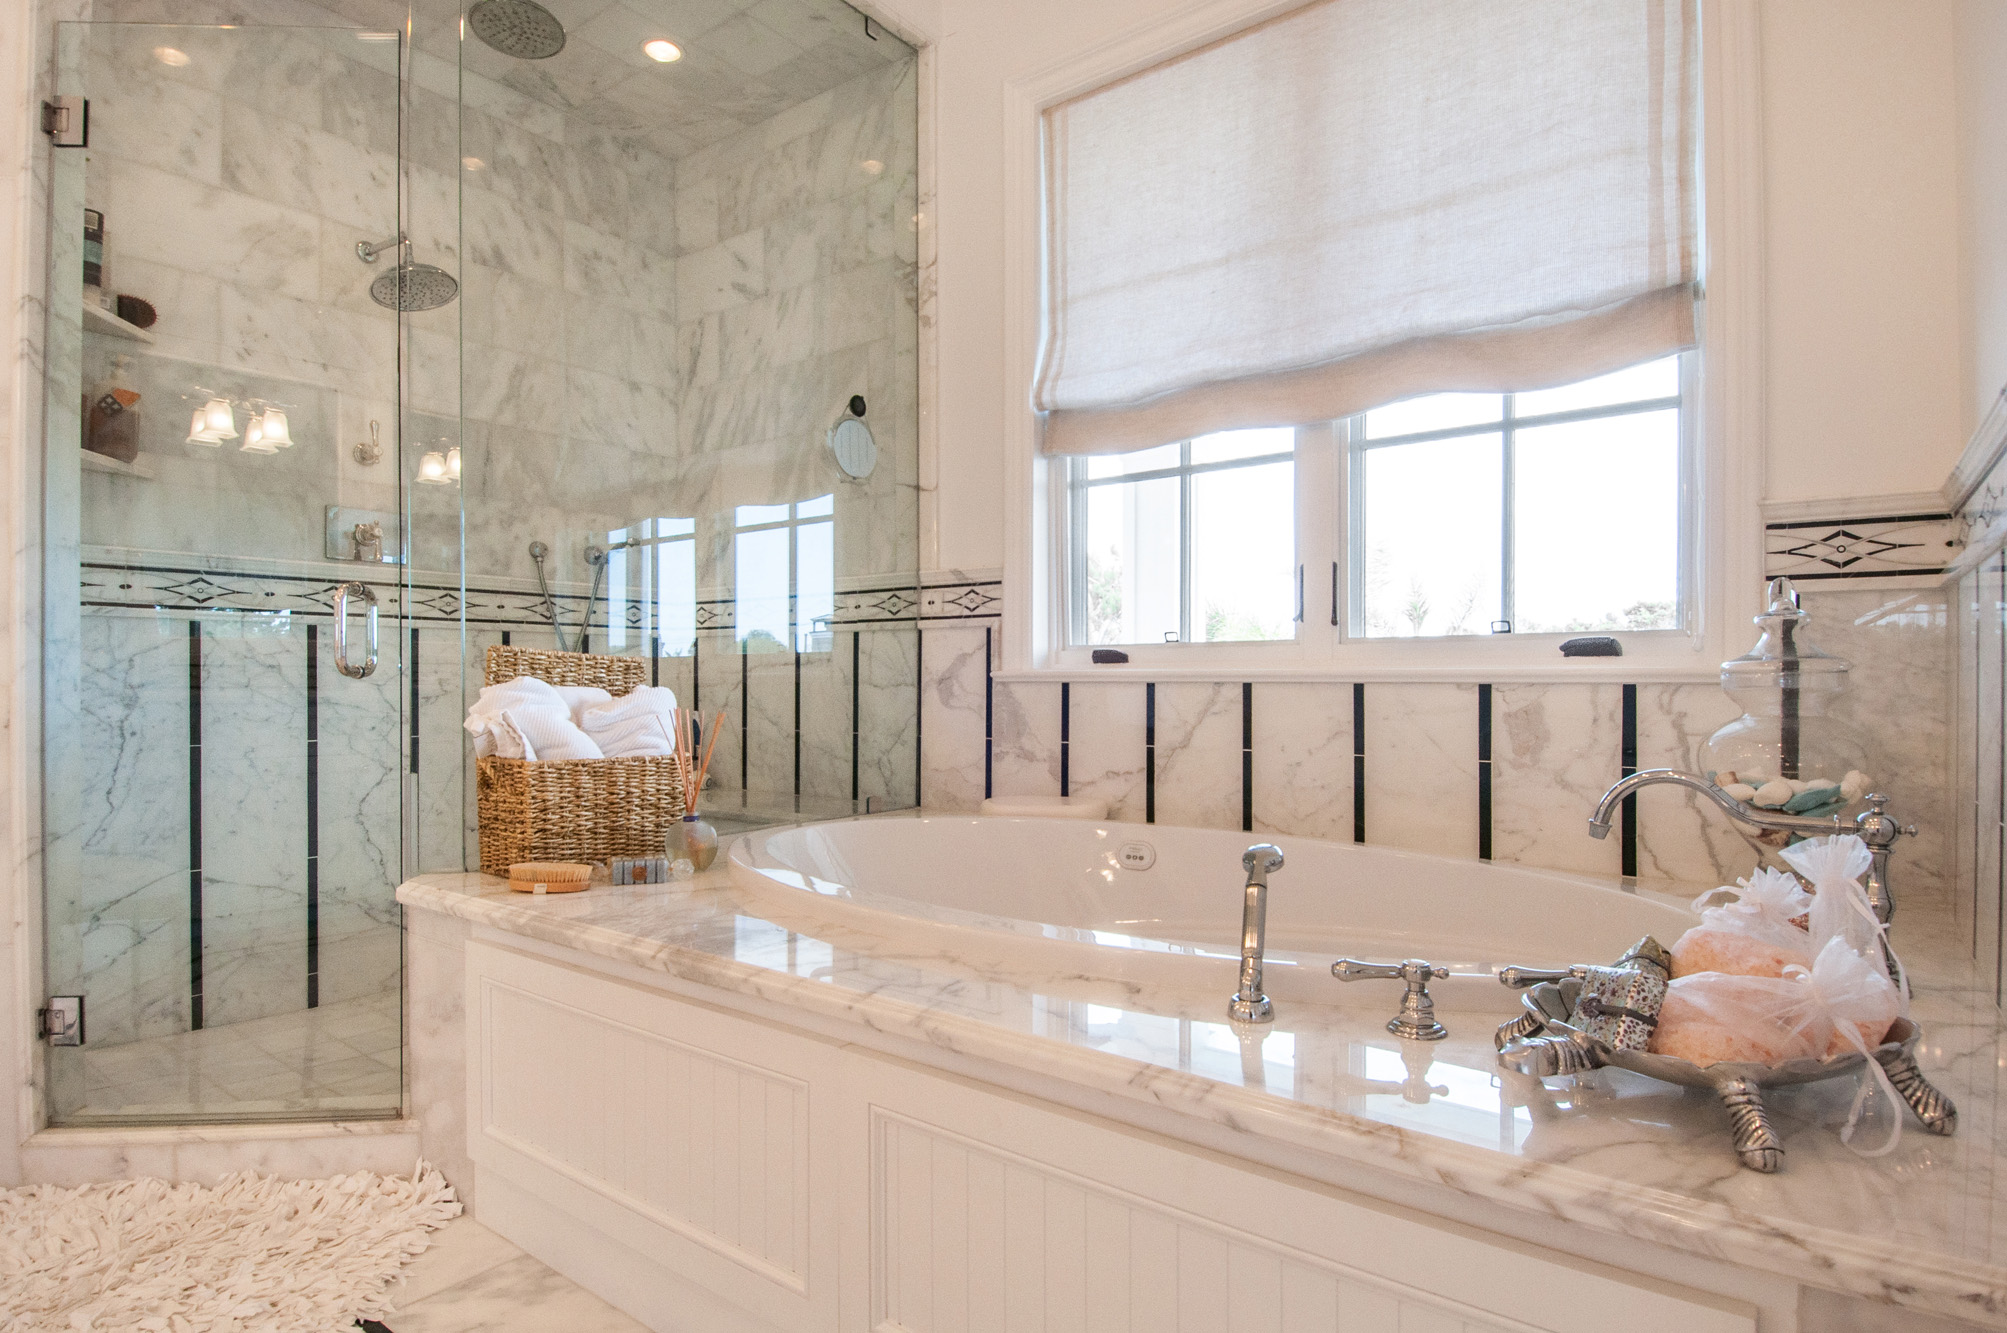 capecod - masterbath - oval tub.jpg